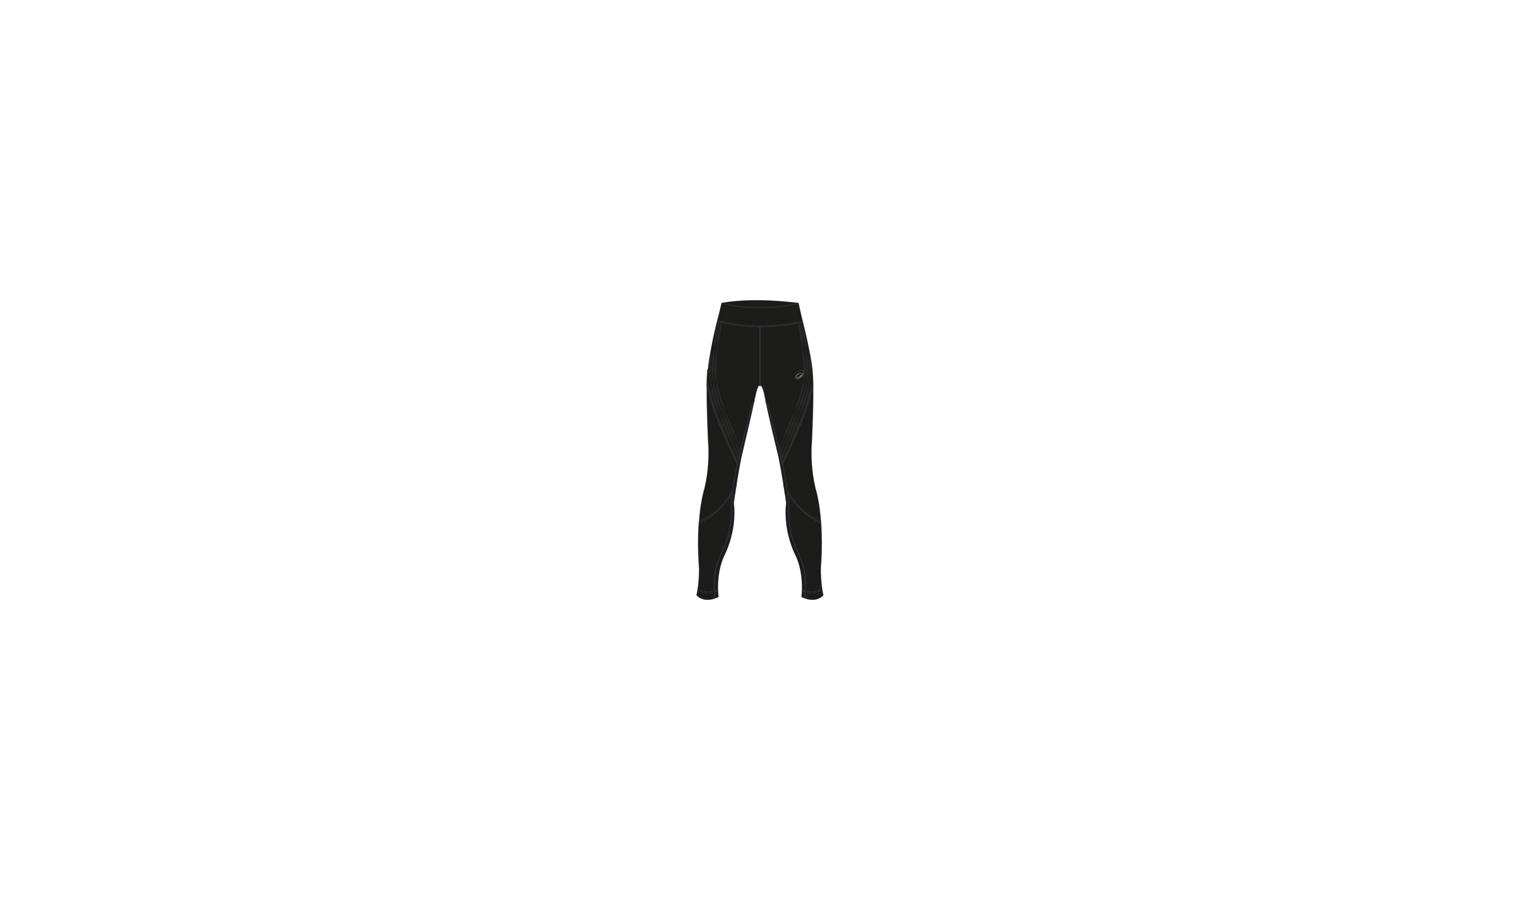 a79a5b9627a58 Dámske bežecké nohavice Asics LITE-SHOW WINTER TIGHT (134076-0904 ...